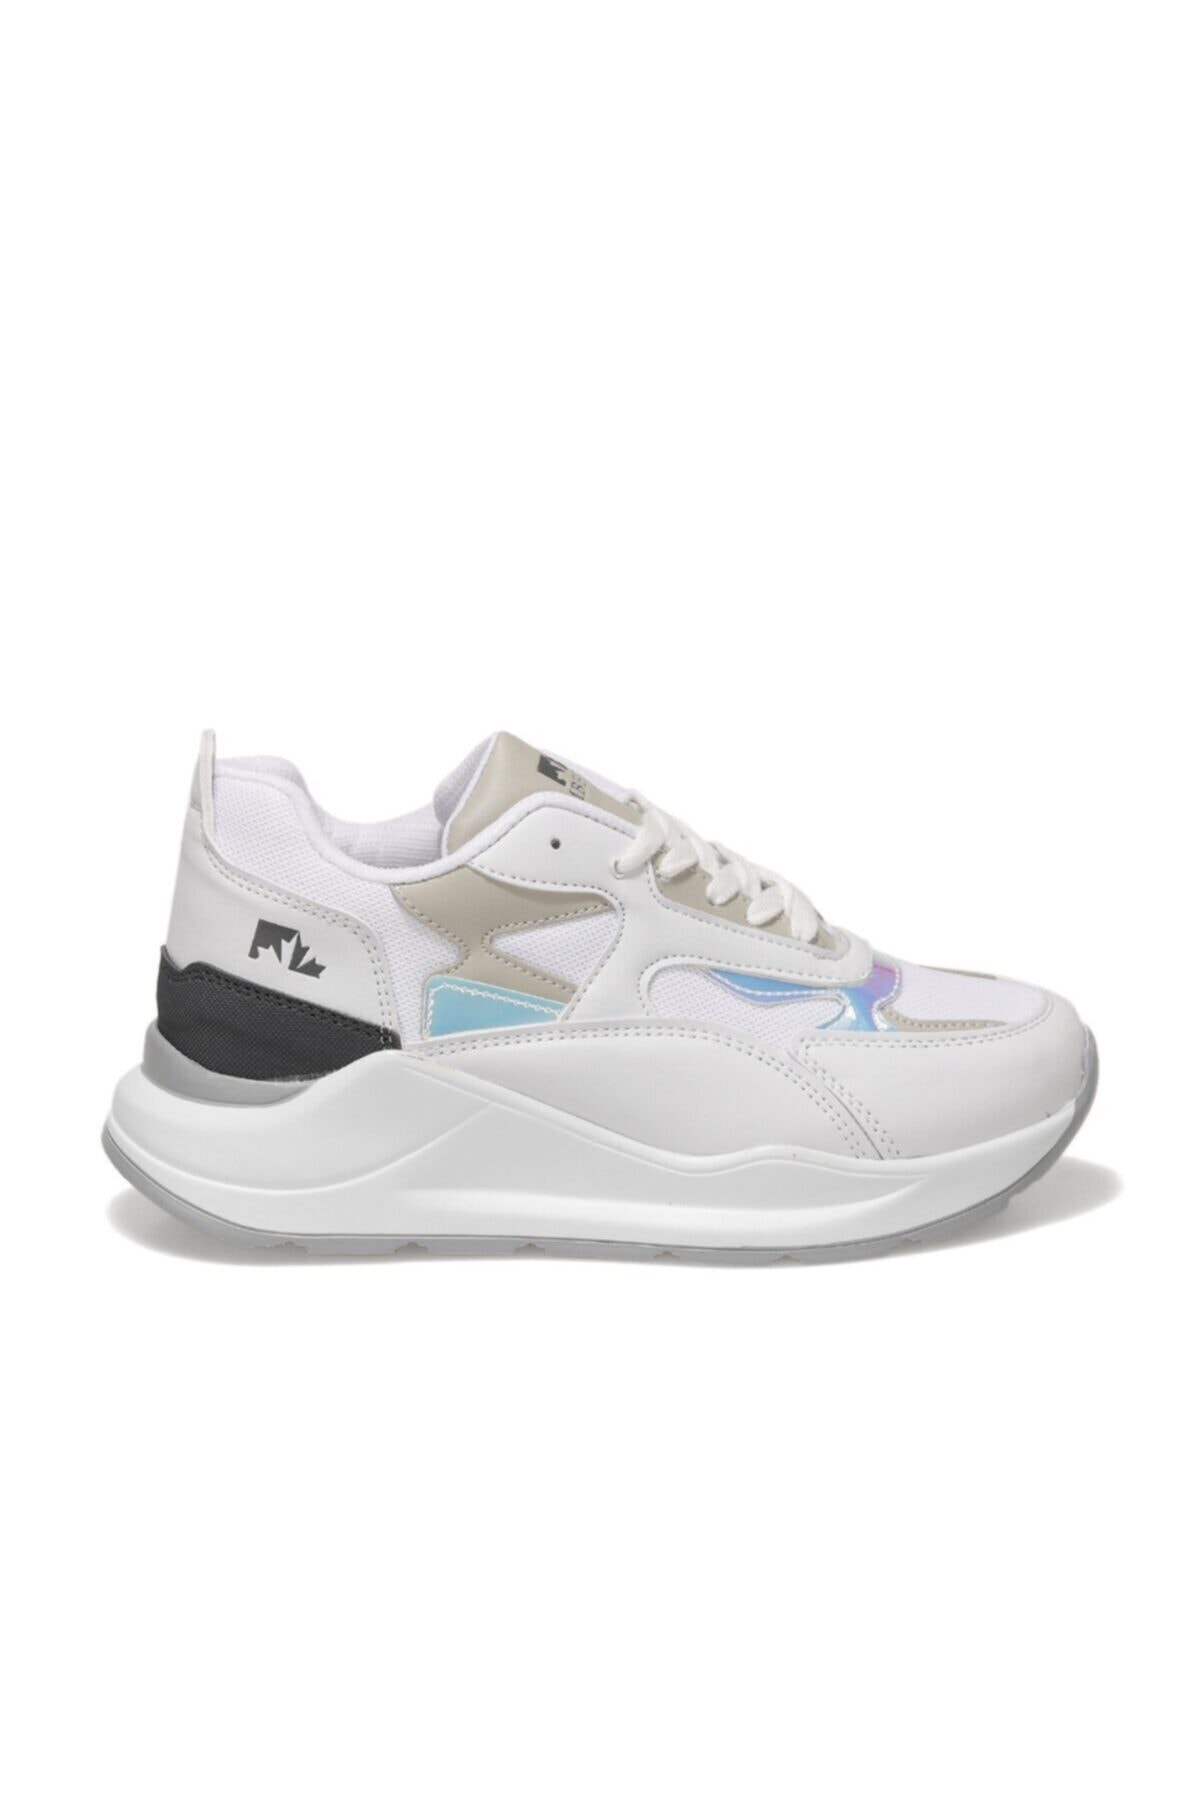 lumberjack NATALIE 1FX Beyaz Kadın Fashion Sneaker 100919011 2